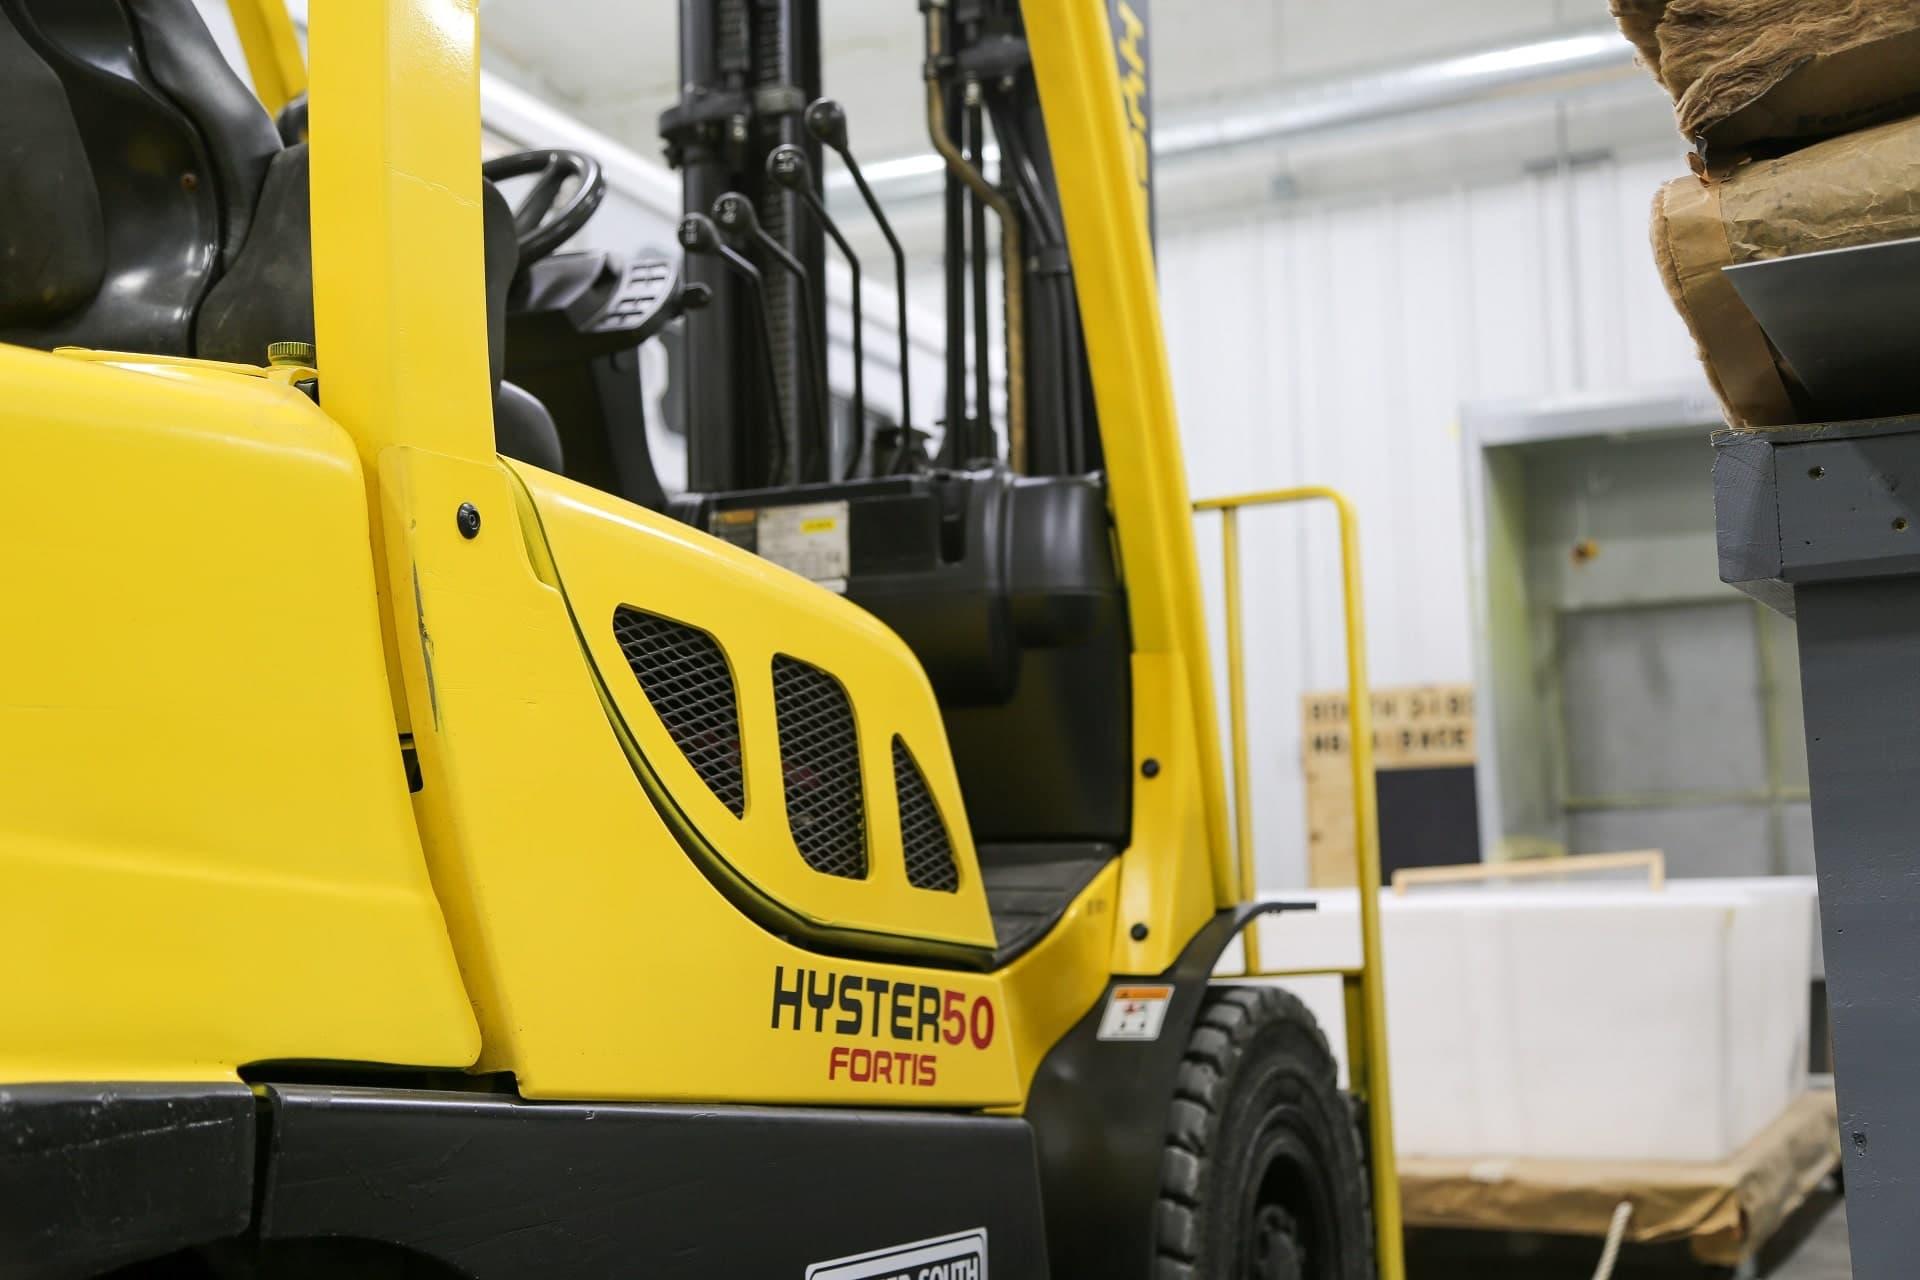 Liberty Partners Forklift